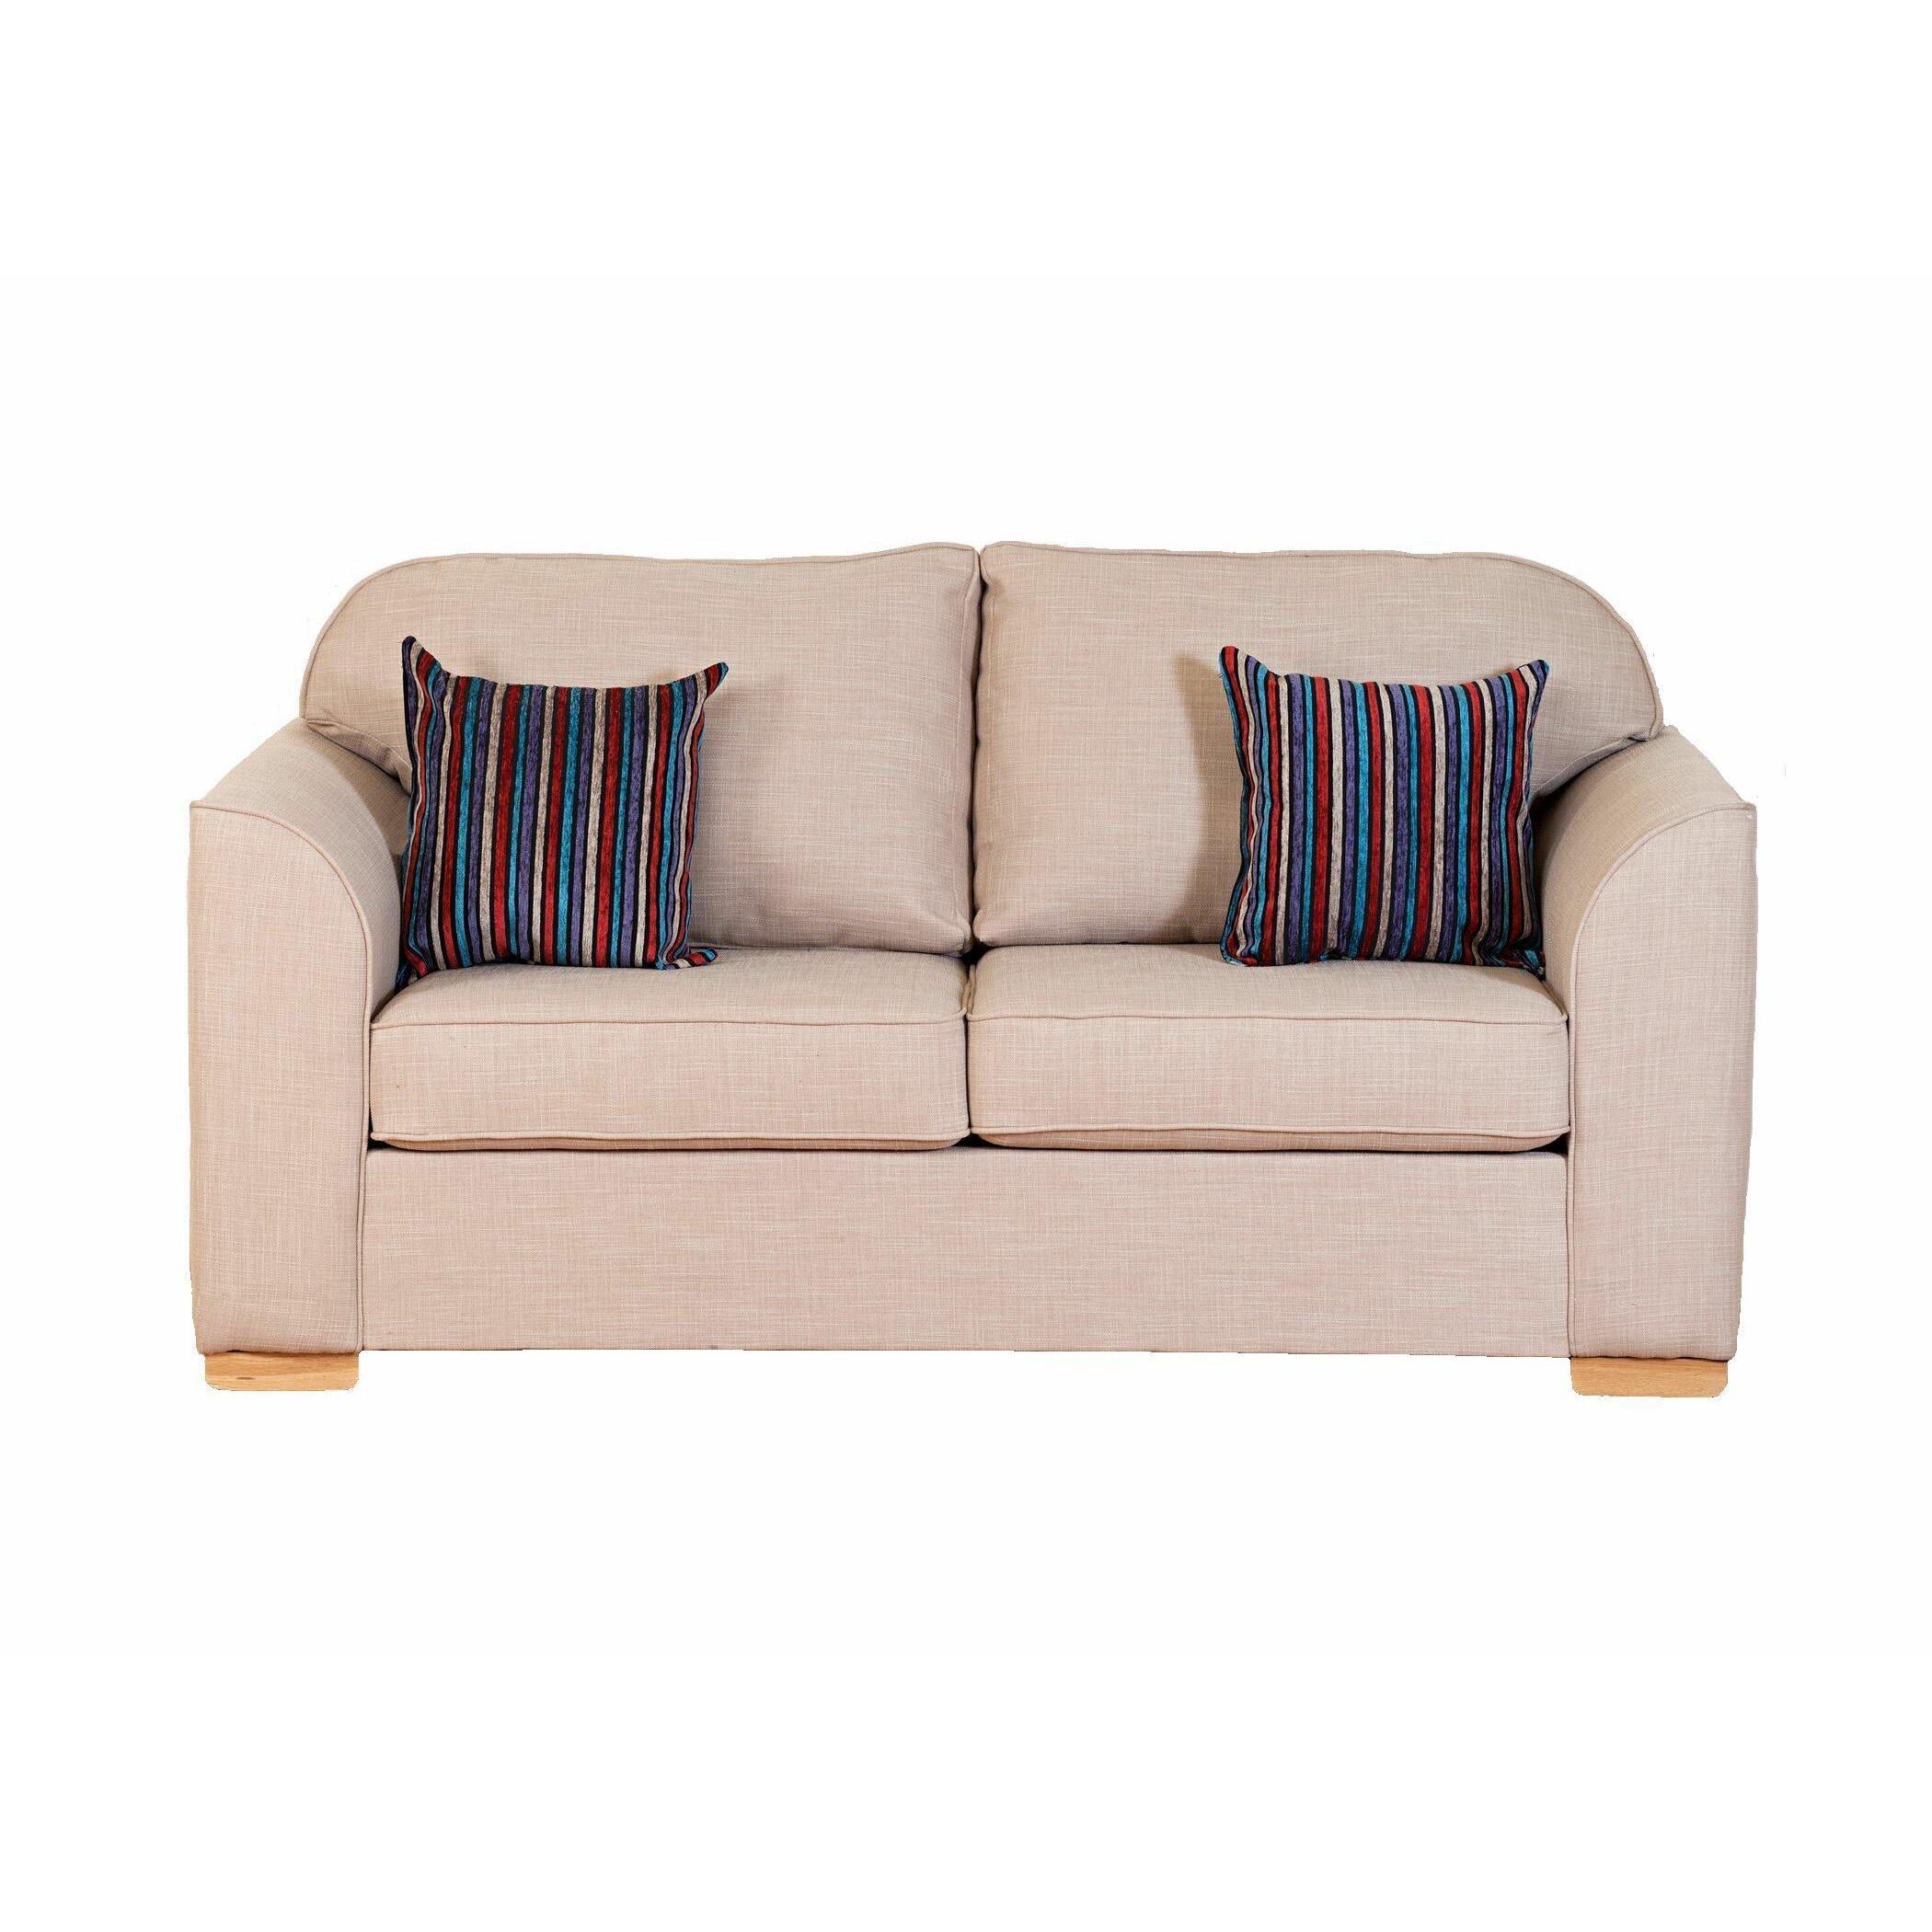 Kyoto Belgrave 2 Seater Fold Out Sofa Reviews Wayfair Uk